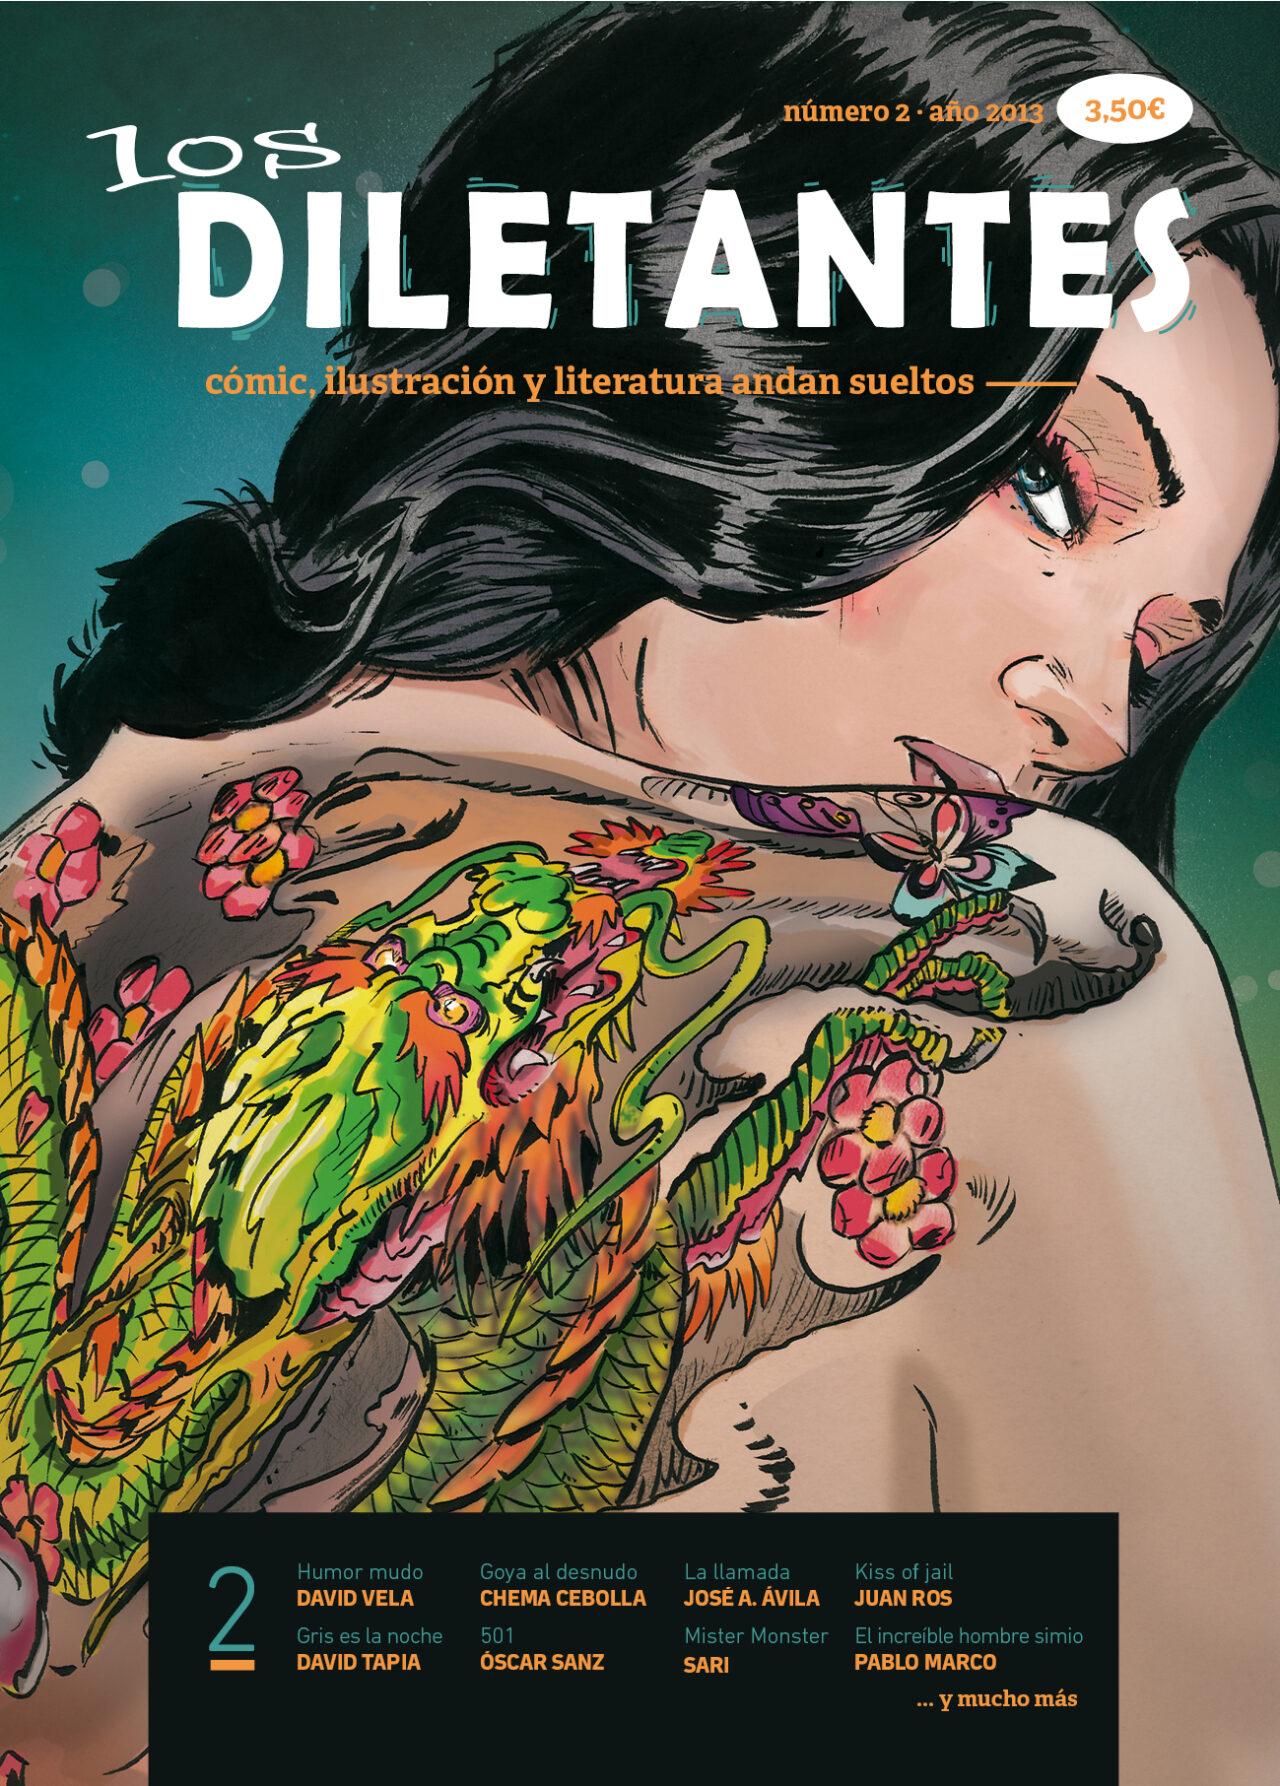 Los diletantes-N2-V1 alternate